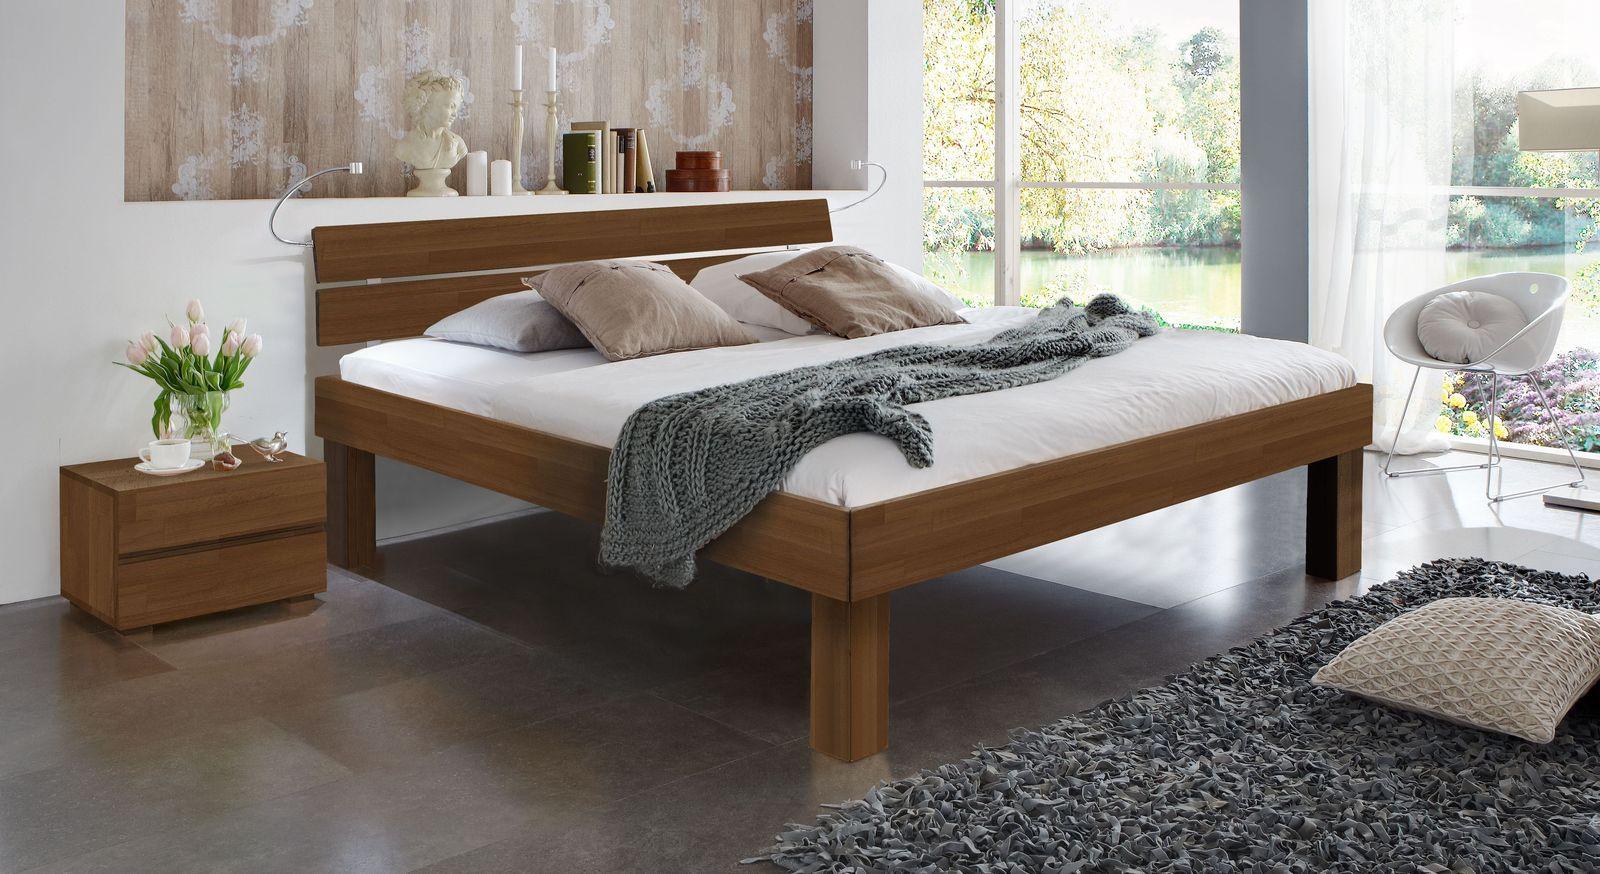 Nussbaumfarbenes Doppelbett Madrid Komfort in 30 cm Höhe